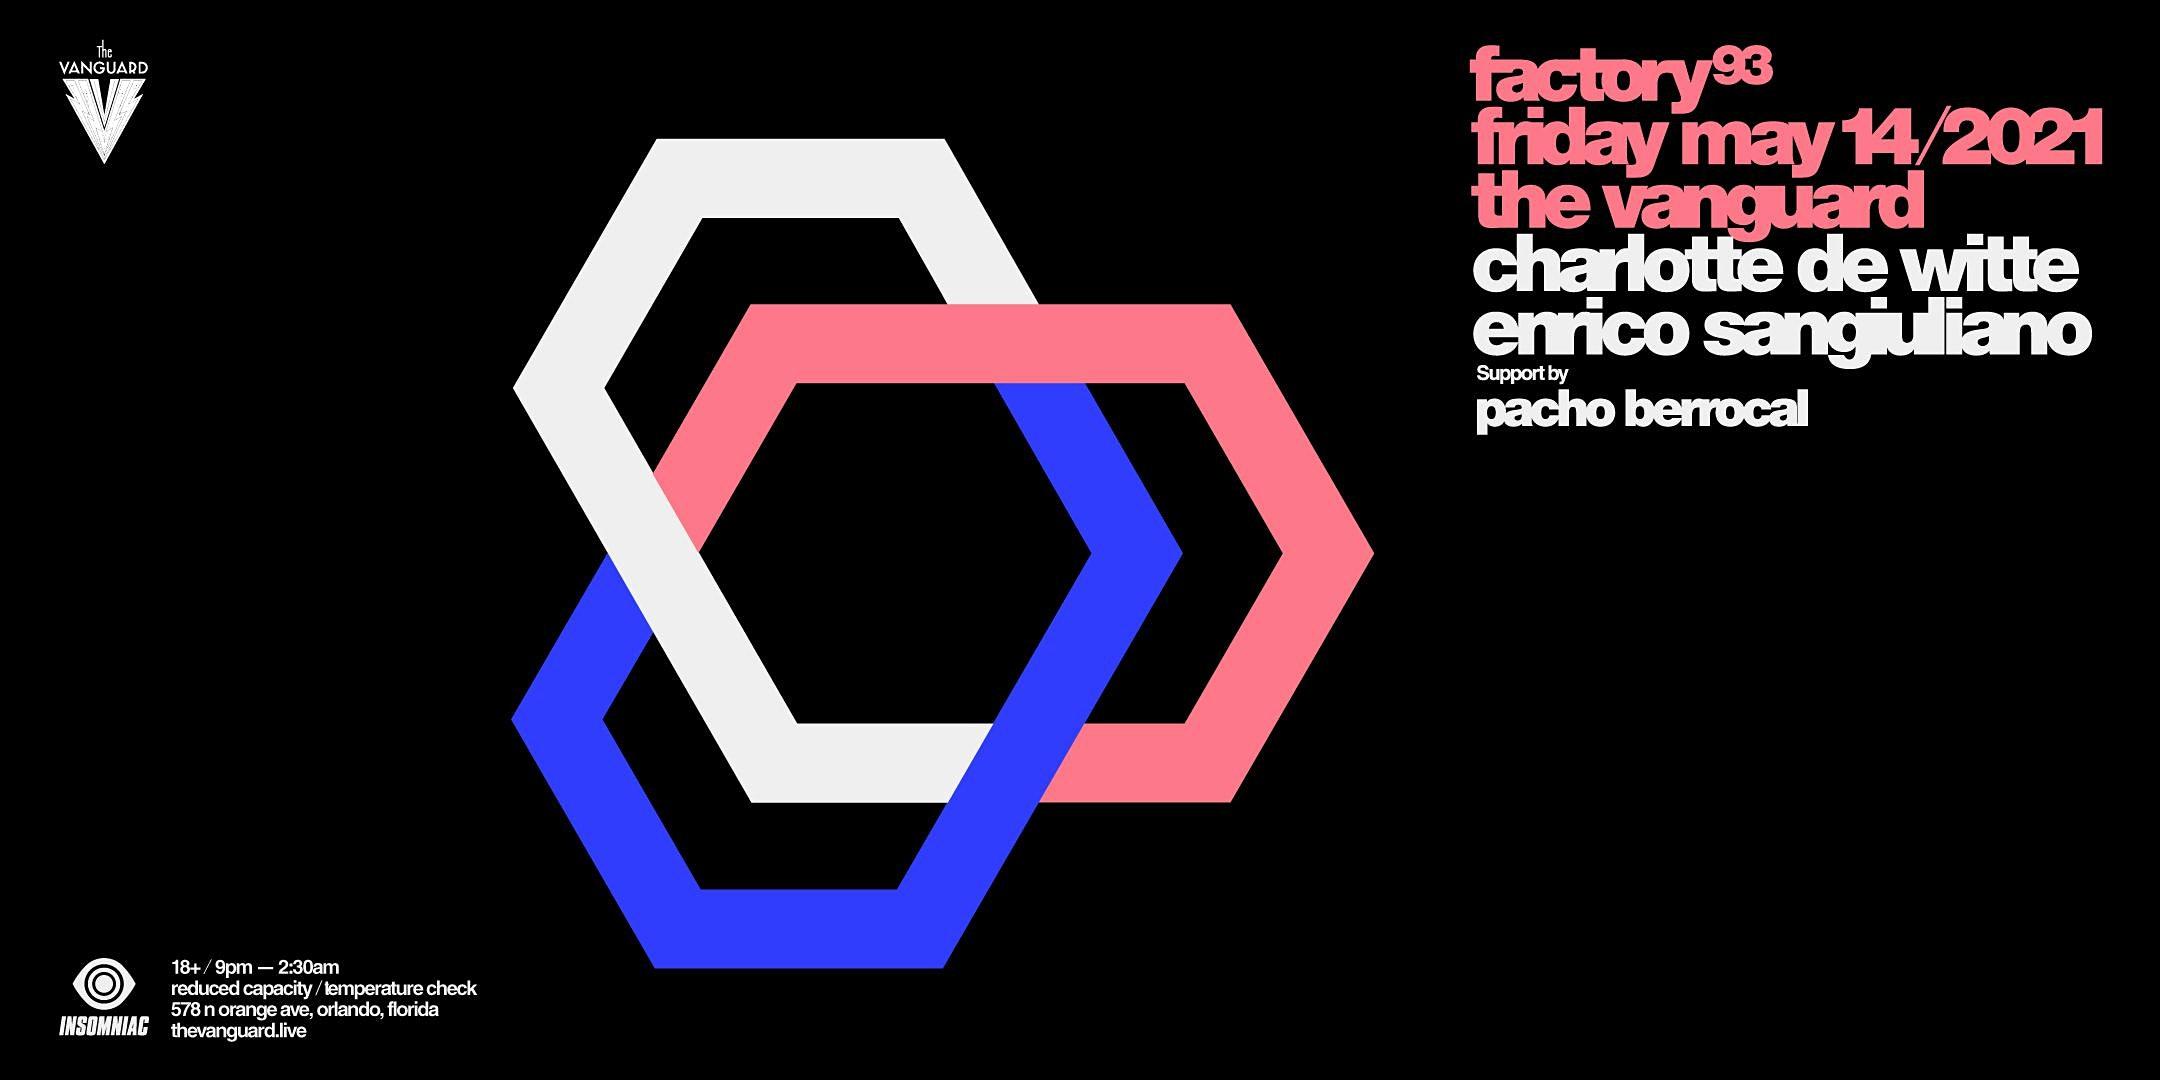 Factory93 Presents: Charlotte De  Witte